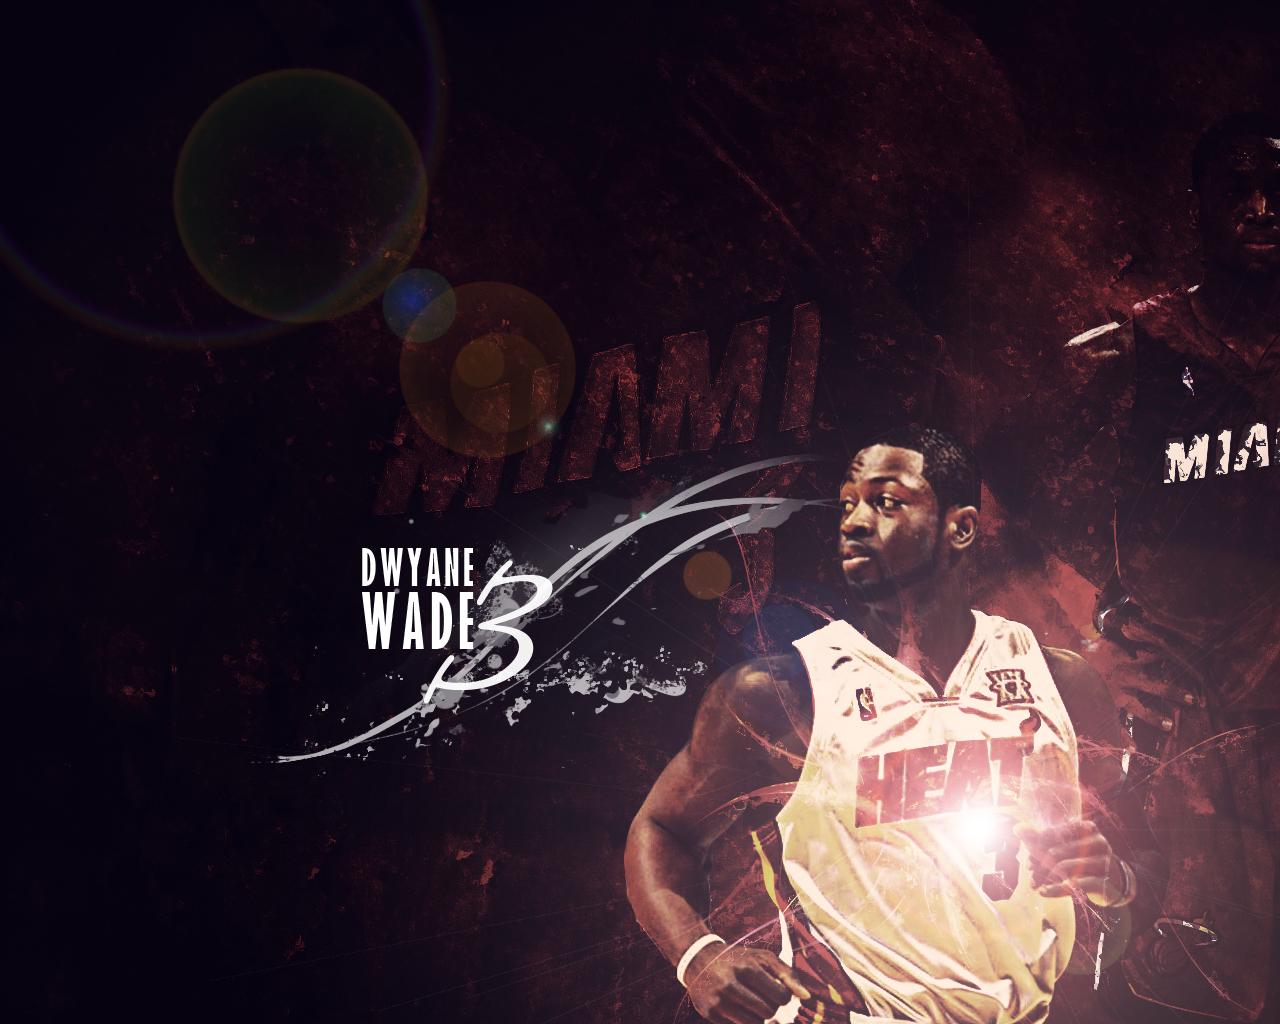 Basketball DWyane Wade Wallpaper HD 626 Wallpaper HDwallsizecom 1280x1024